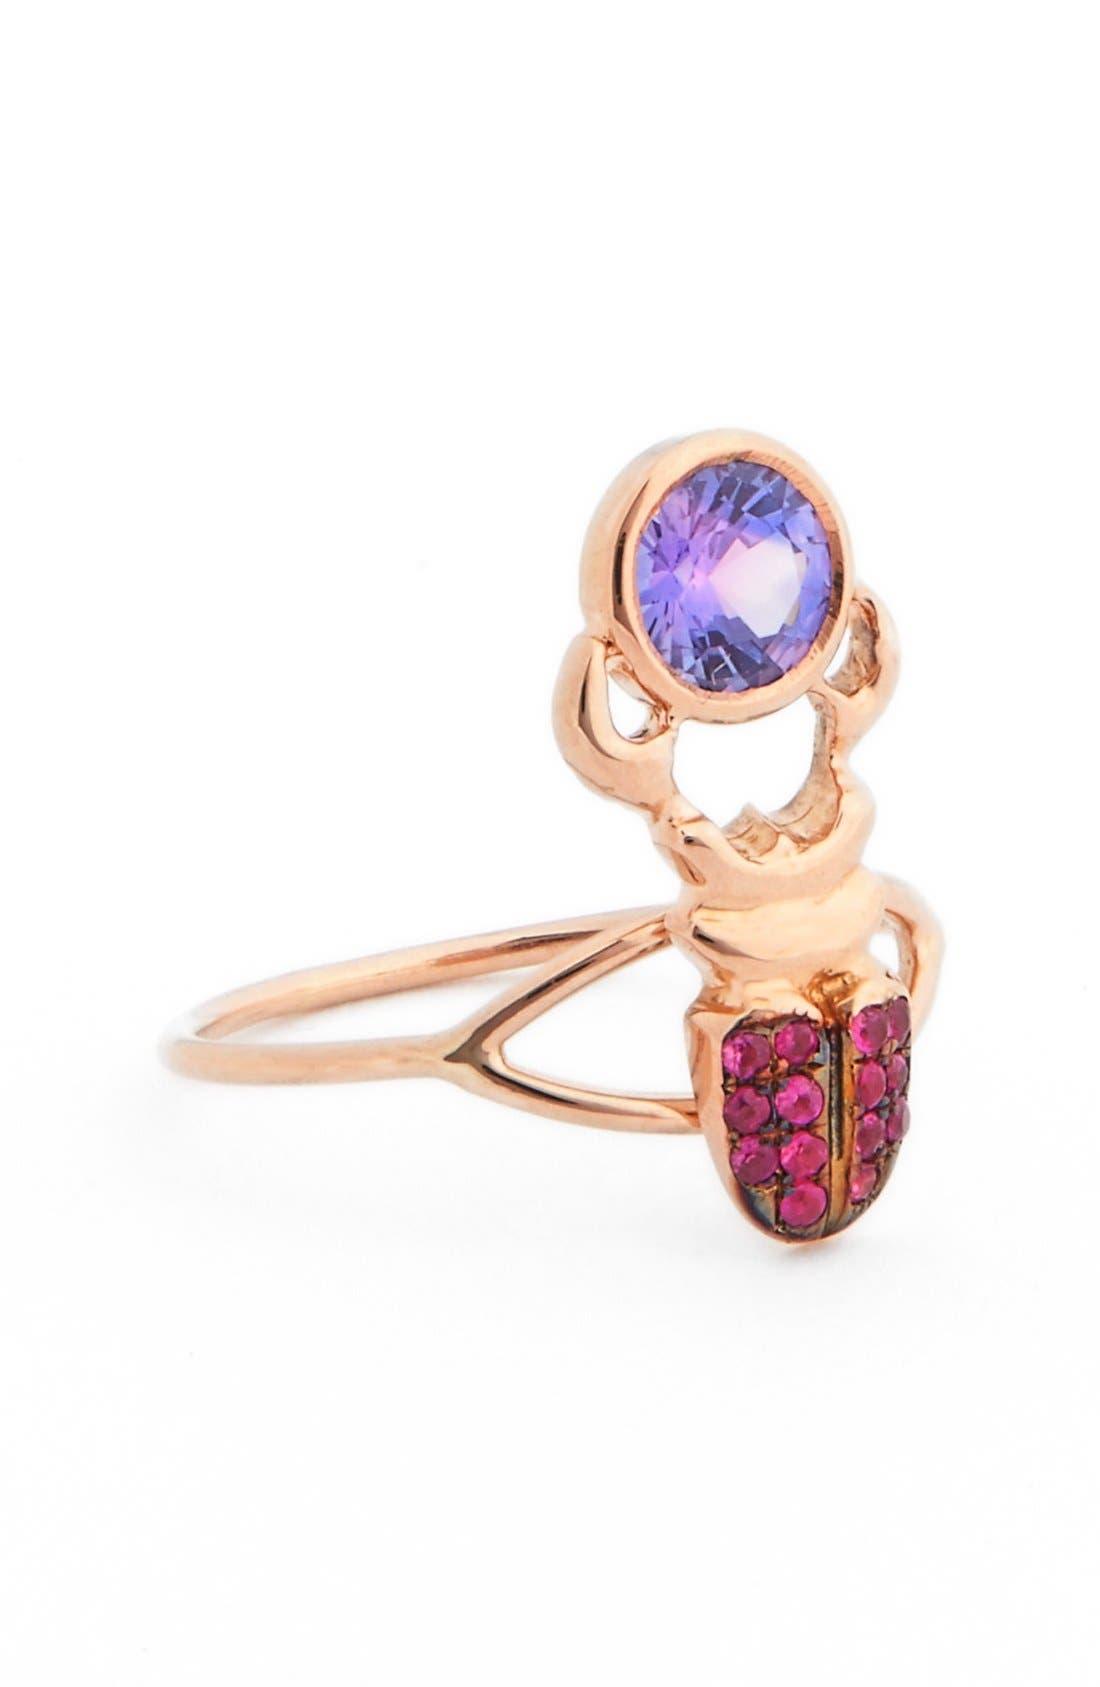 DANIELA VILLEGAS 'Khepri' Sapphire Ring